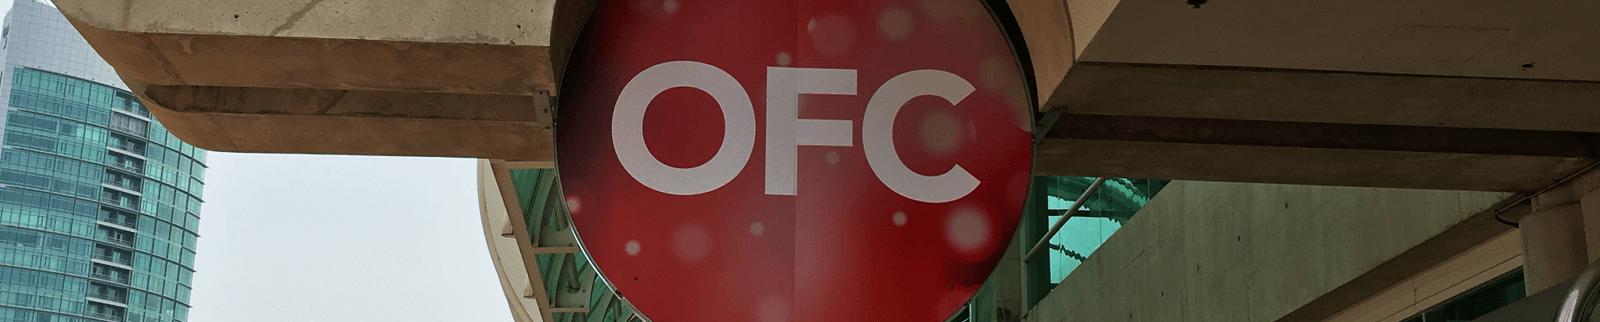 Revotech: OFC 2018 Fiber Optics Industry Showcase